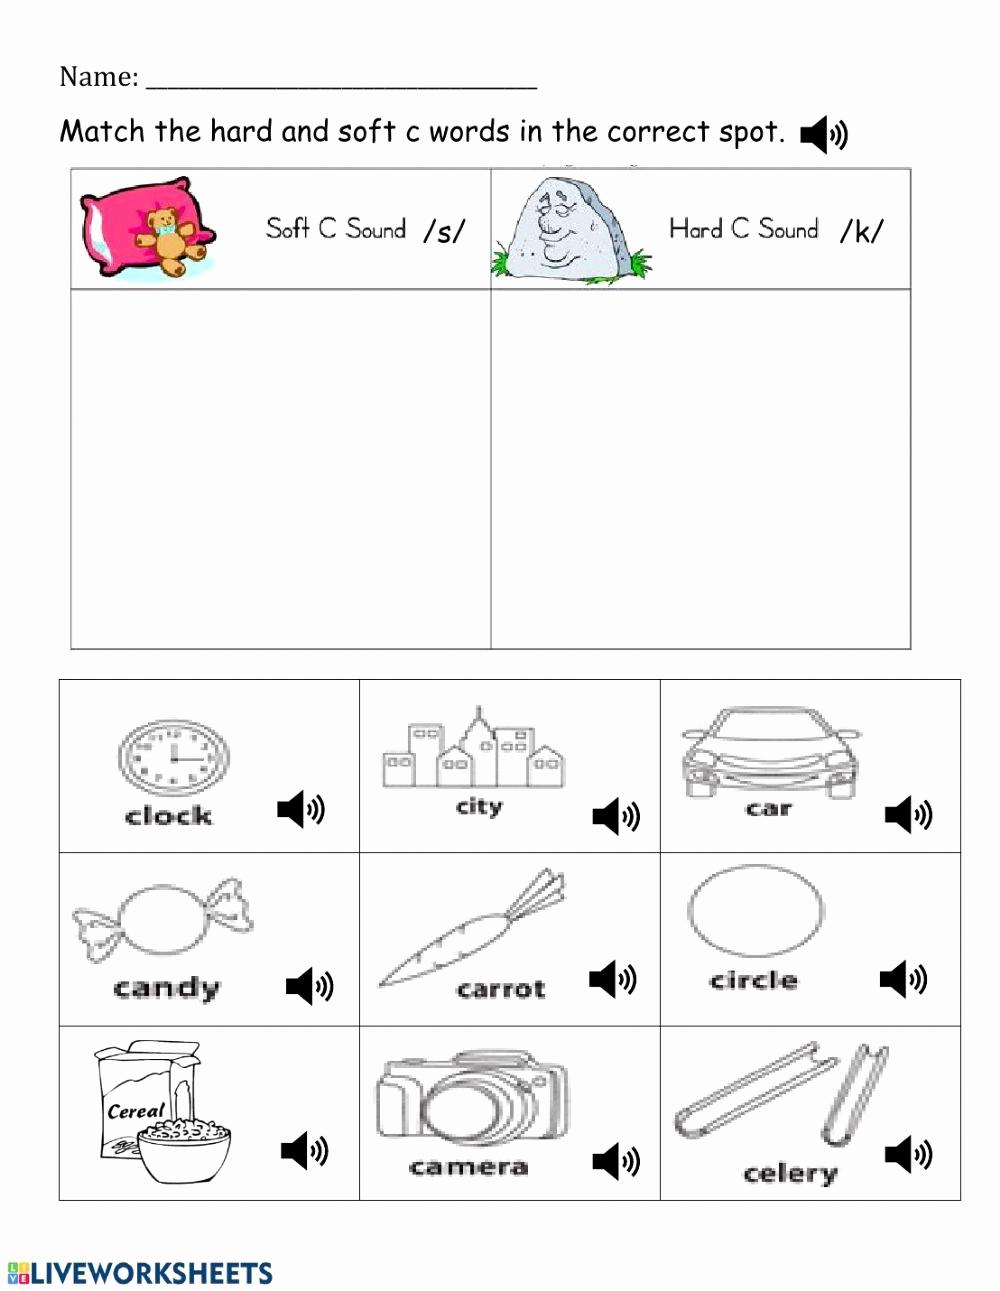 Soft C Words Worksheets Best Of 20 soft C Words Worksheets Dzofar Printable Worksheets